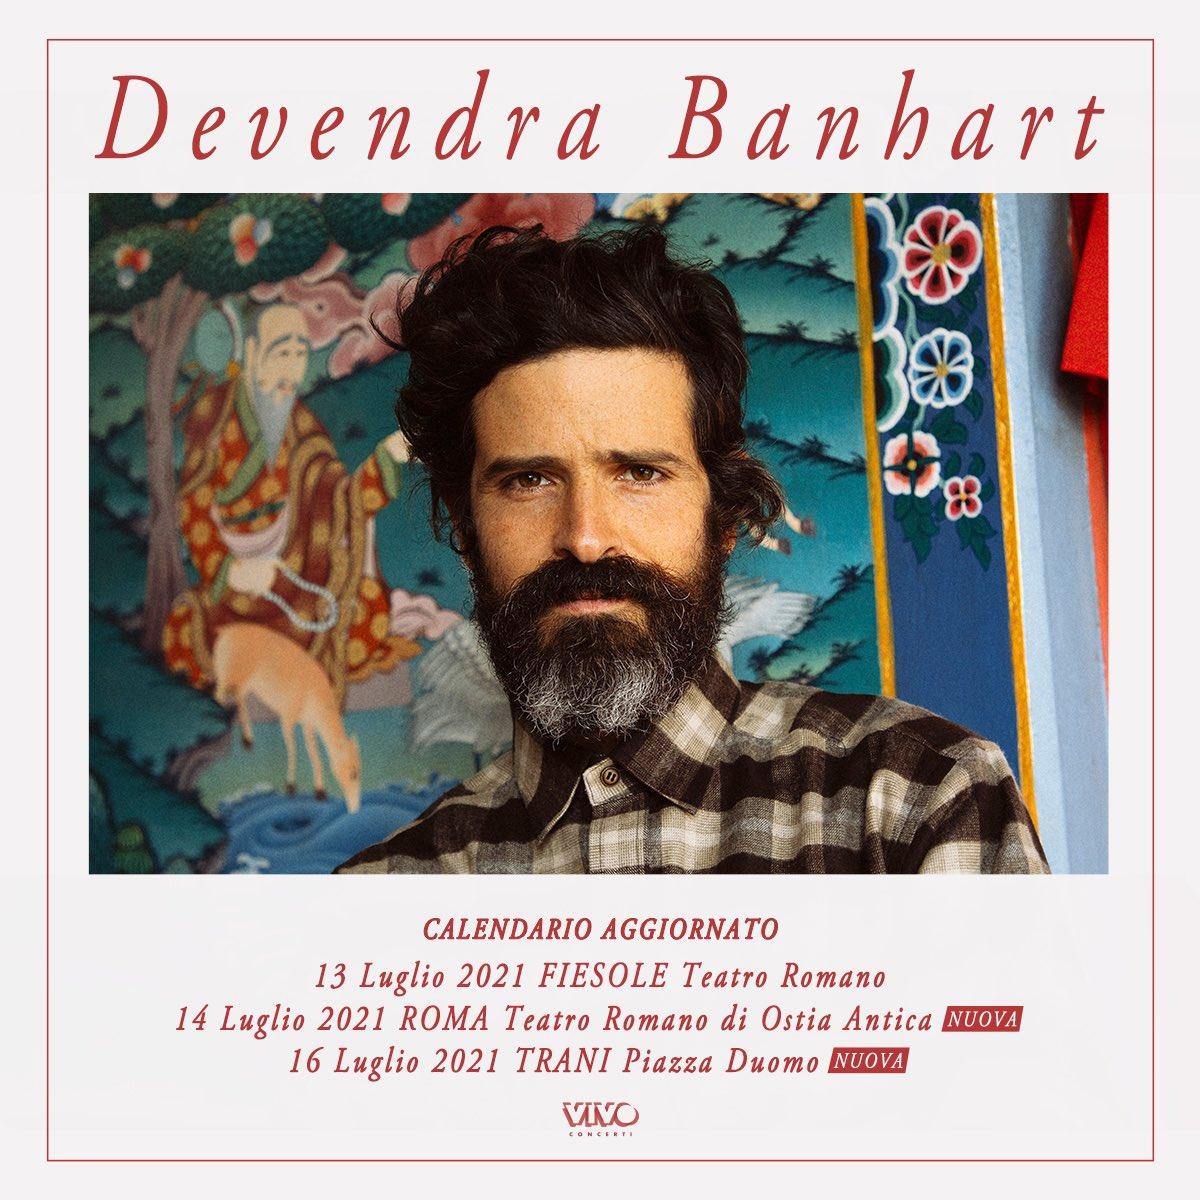 Teatro Romano Calendario 2021 Devendra Banhart (@DevendraBanhart) | Twitter